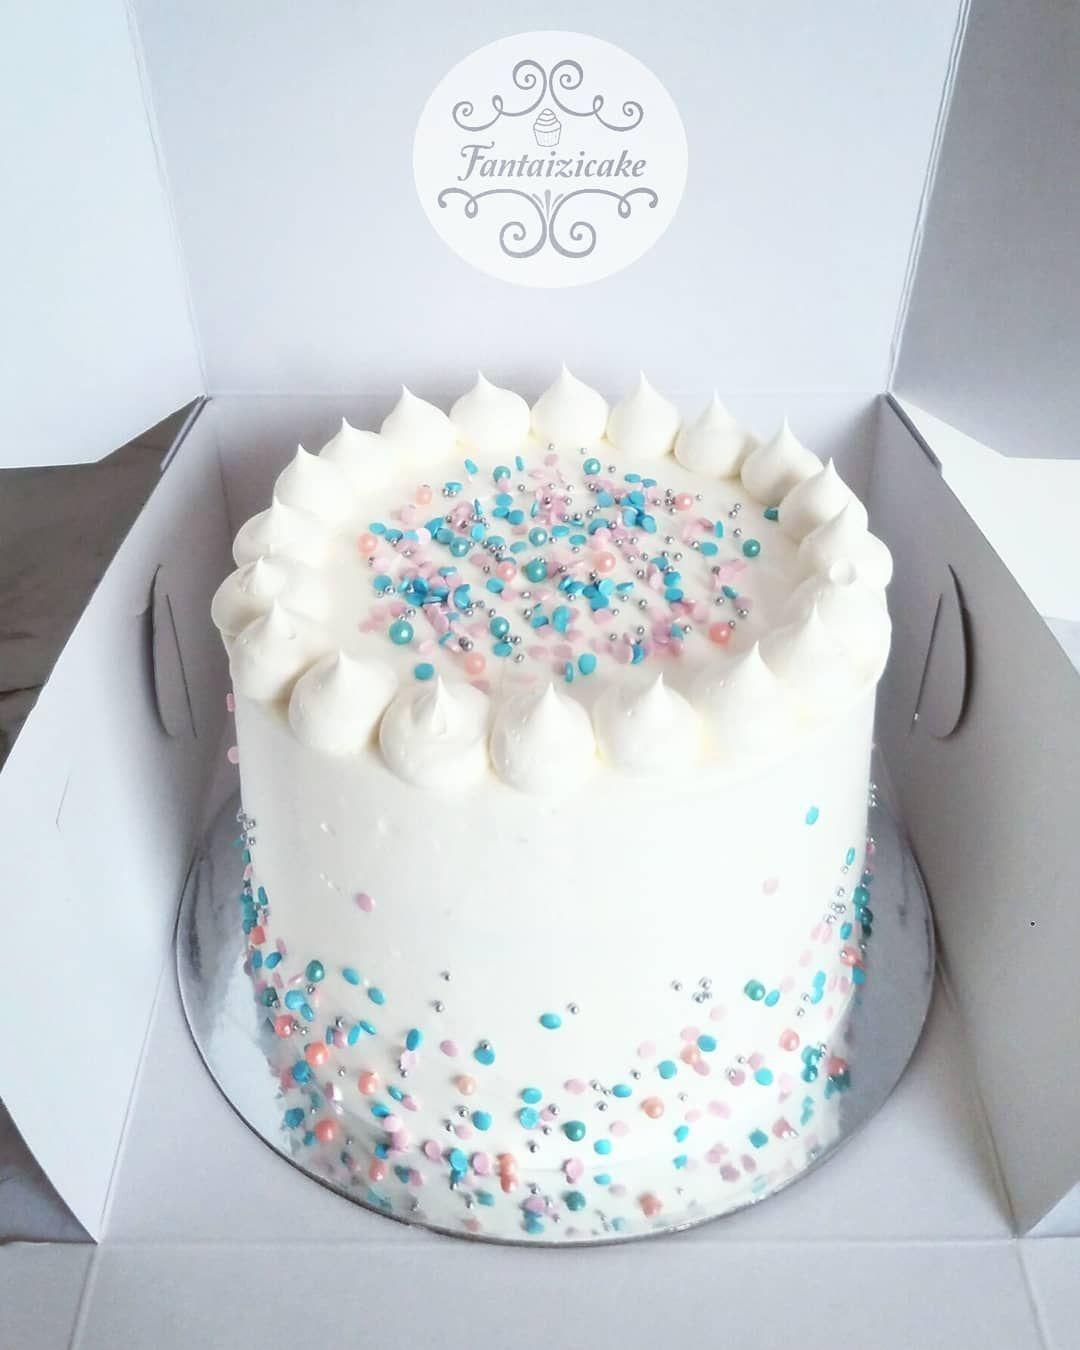 Jongen Of Meisje Genderreveal Taart J M Cake Genderrevealcake Boyorgirl Announcement Itsa Gender Reveal Cupcakes Baby Reveal Cakes Gender Reveal Cake